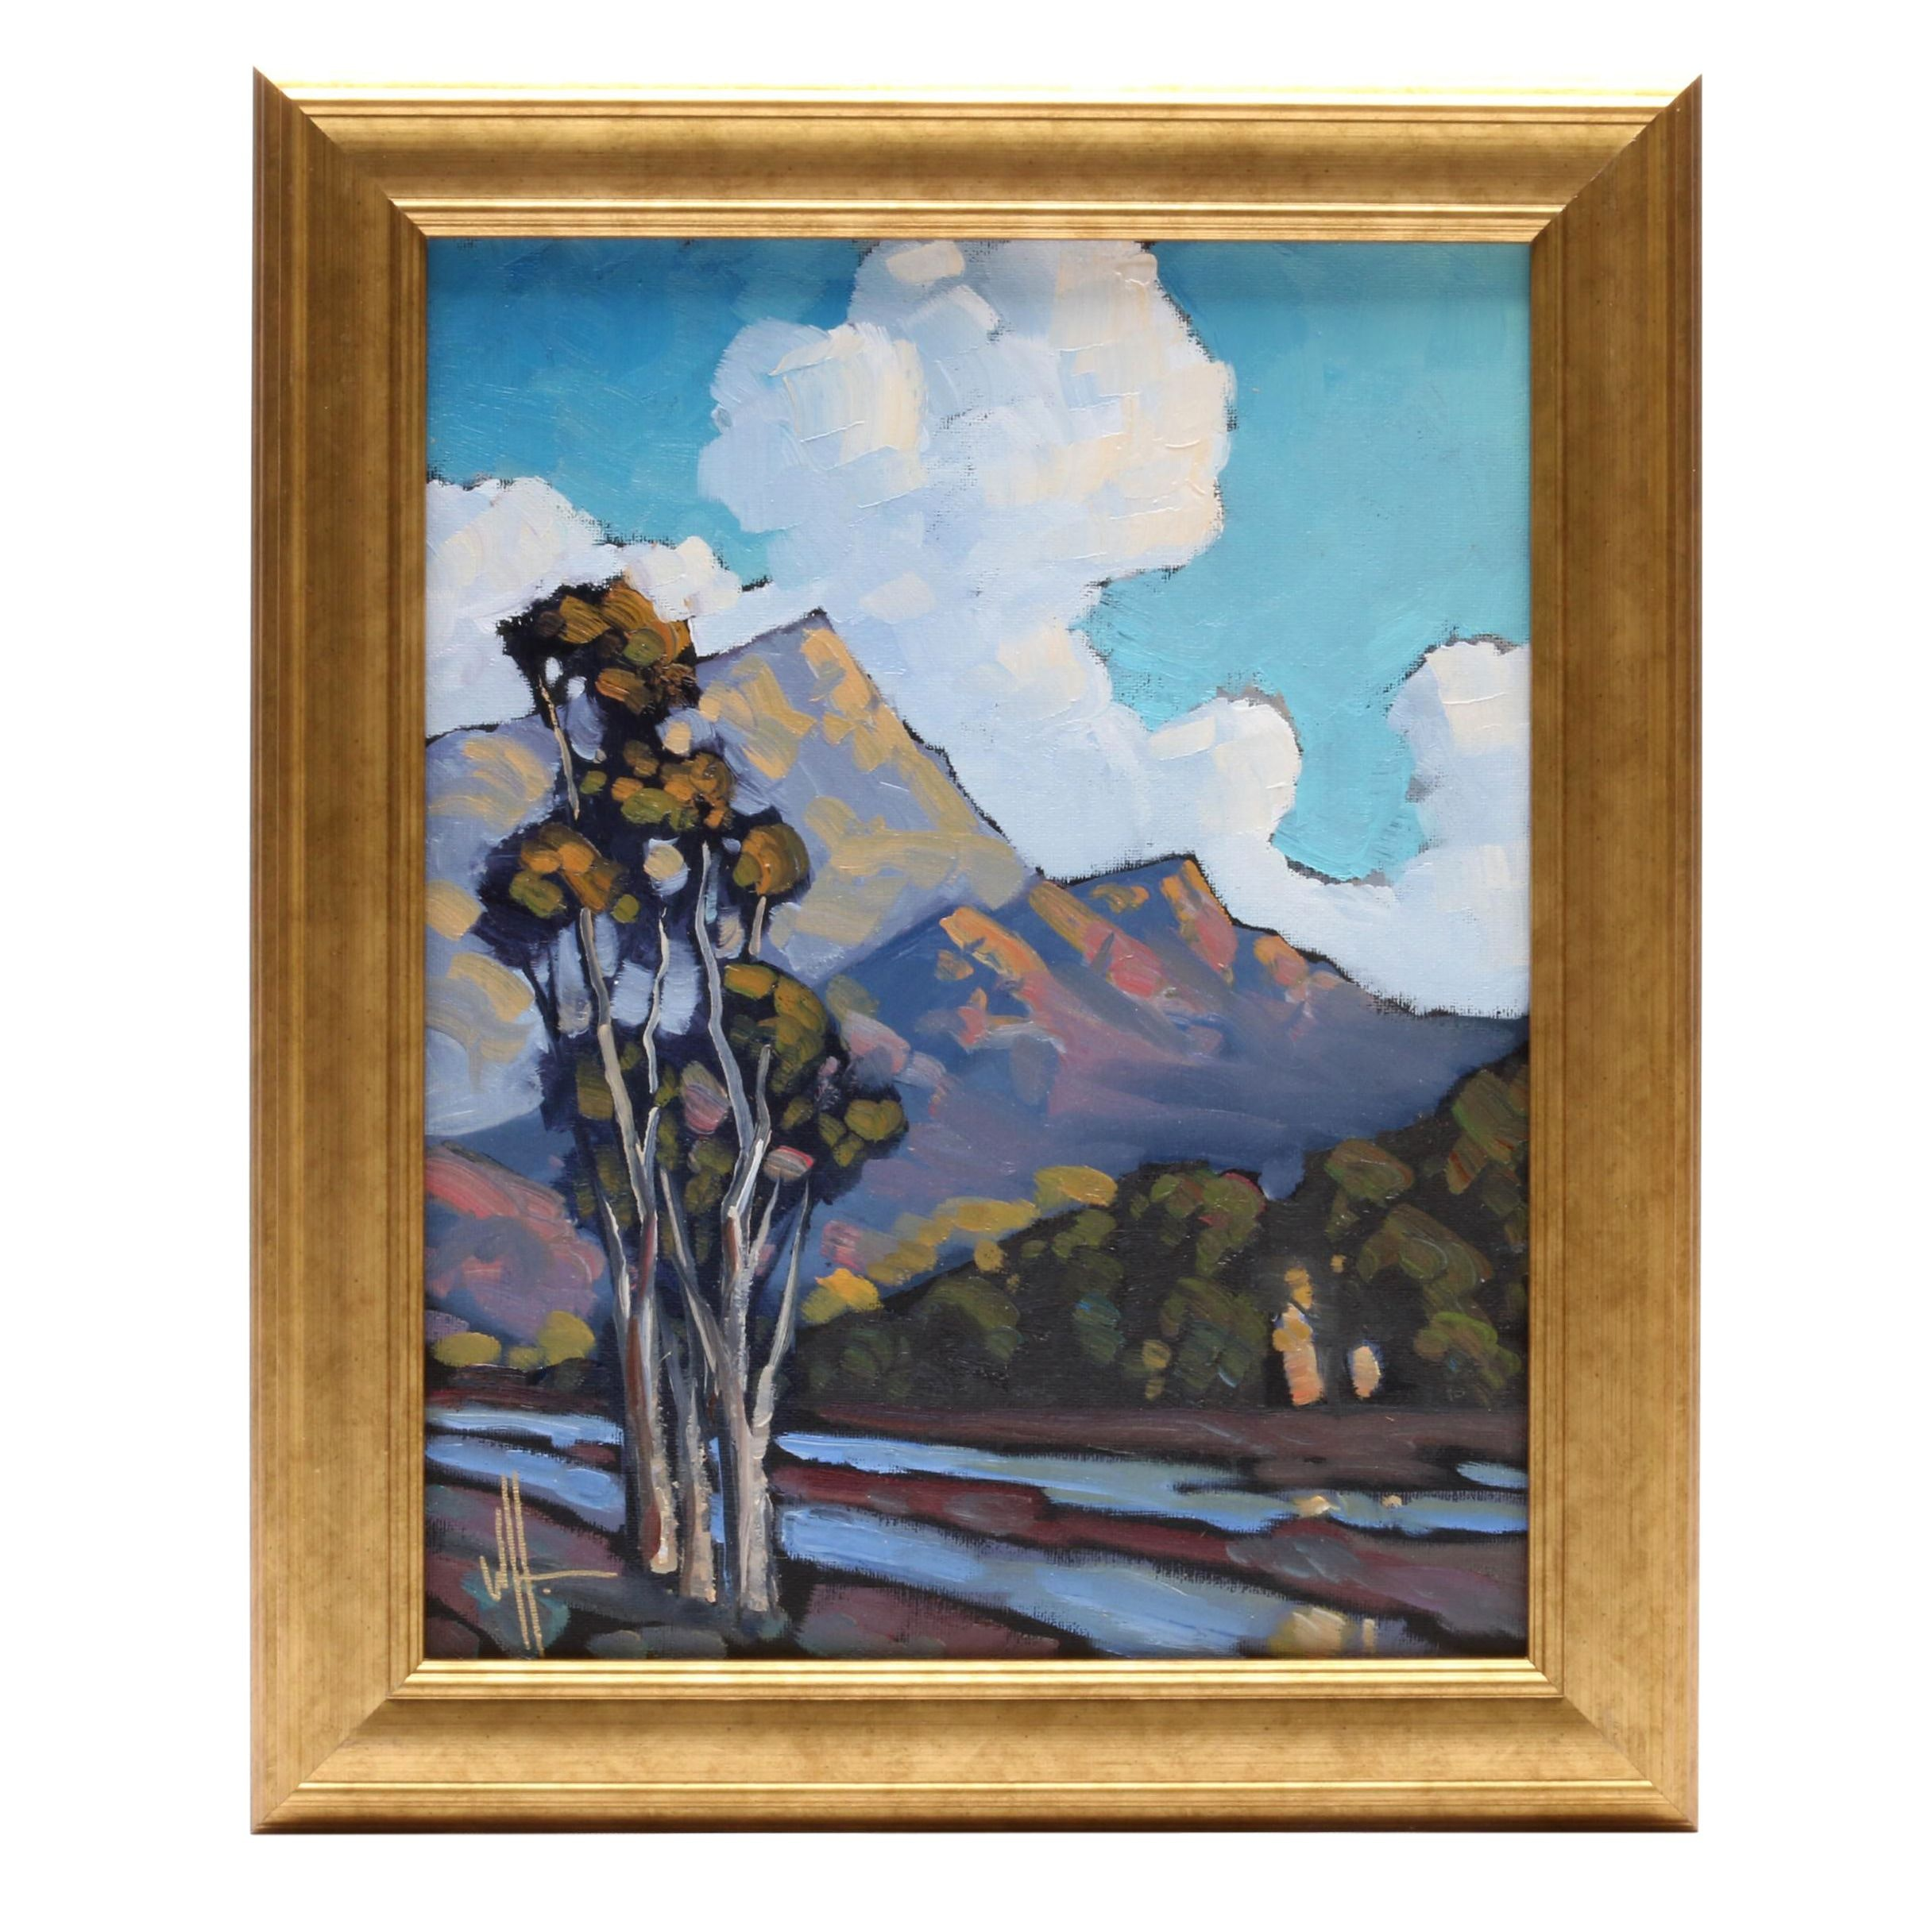 William Hawkins 2018 American Landscape Oil Painting